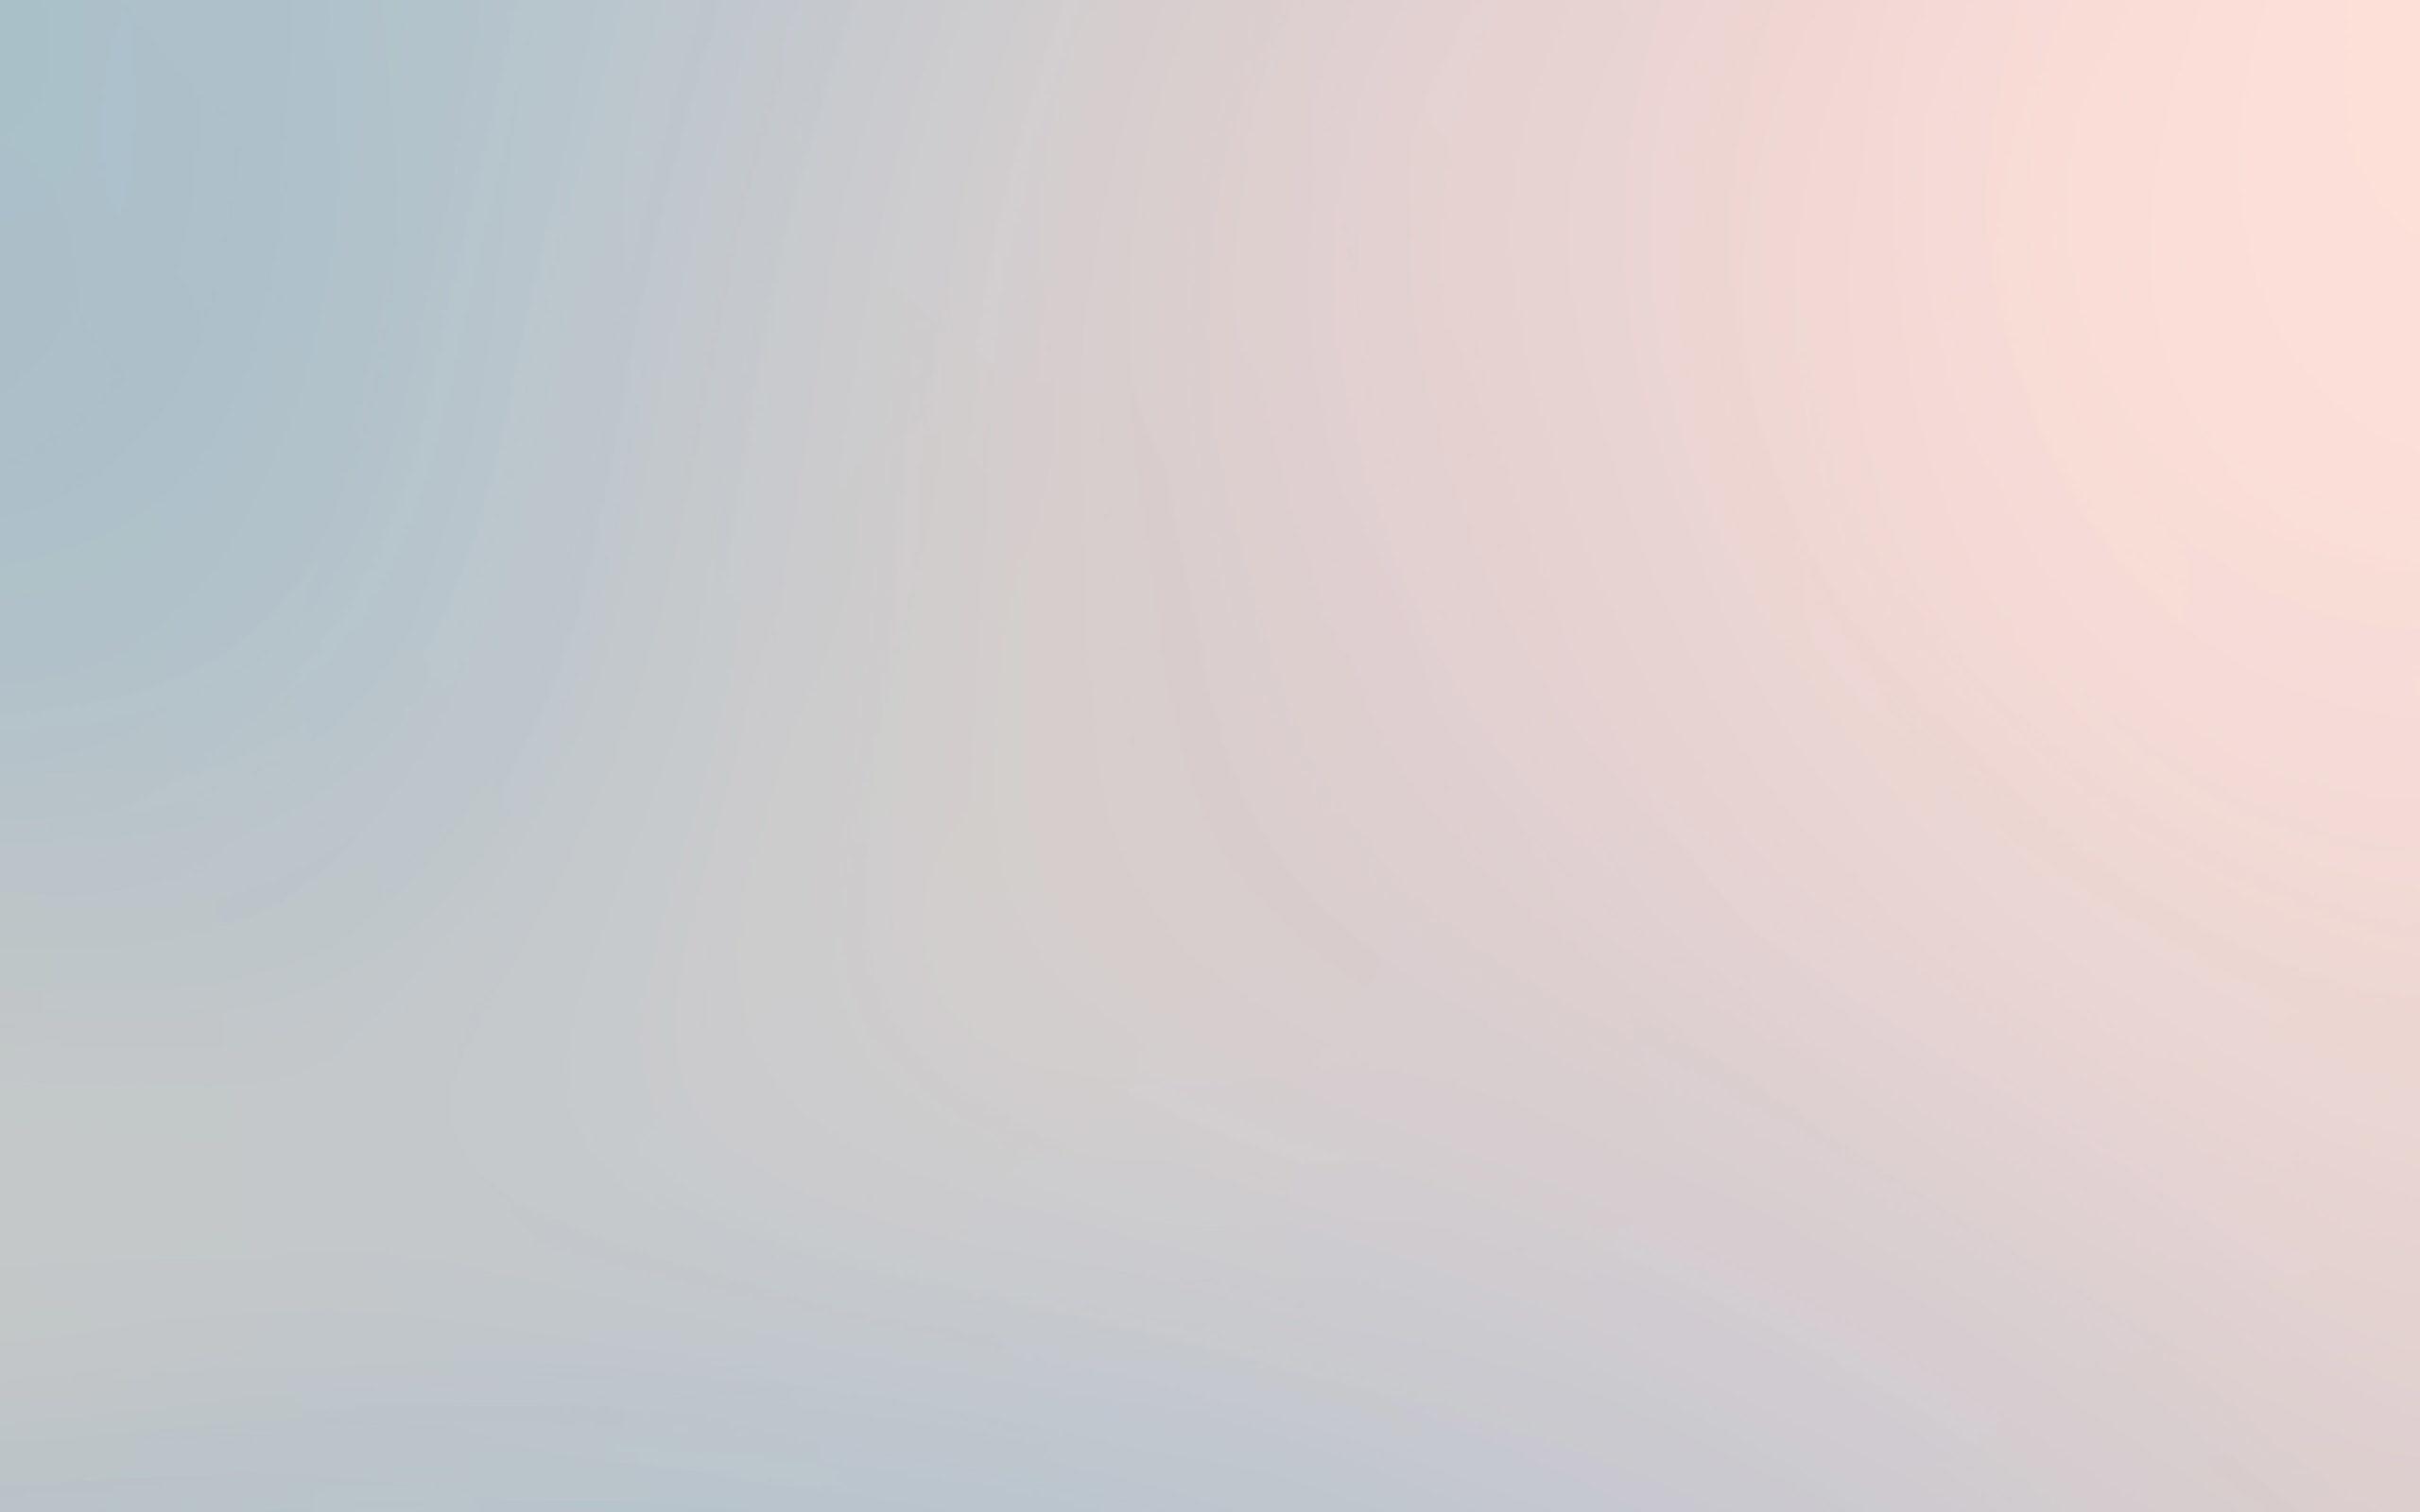 papers.co-sa52-blurred-white-blur-wallpaper-36-3840x2400-4k-wallpaper